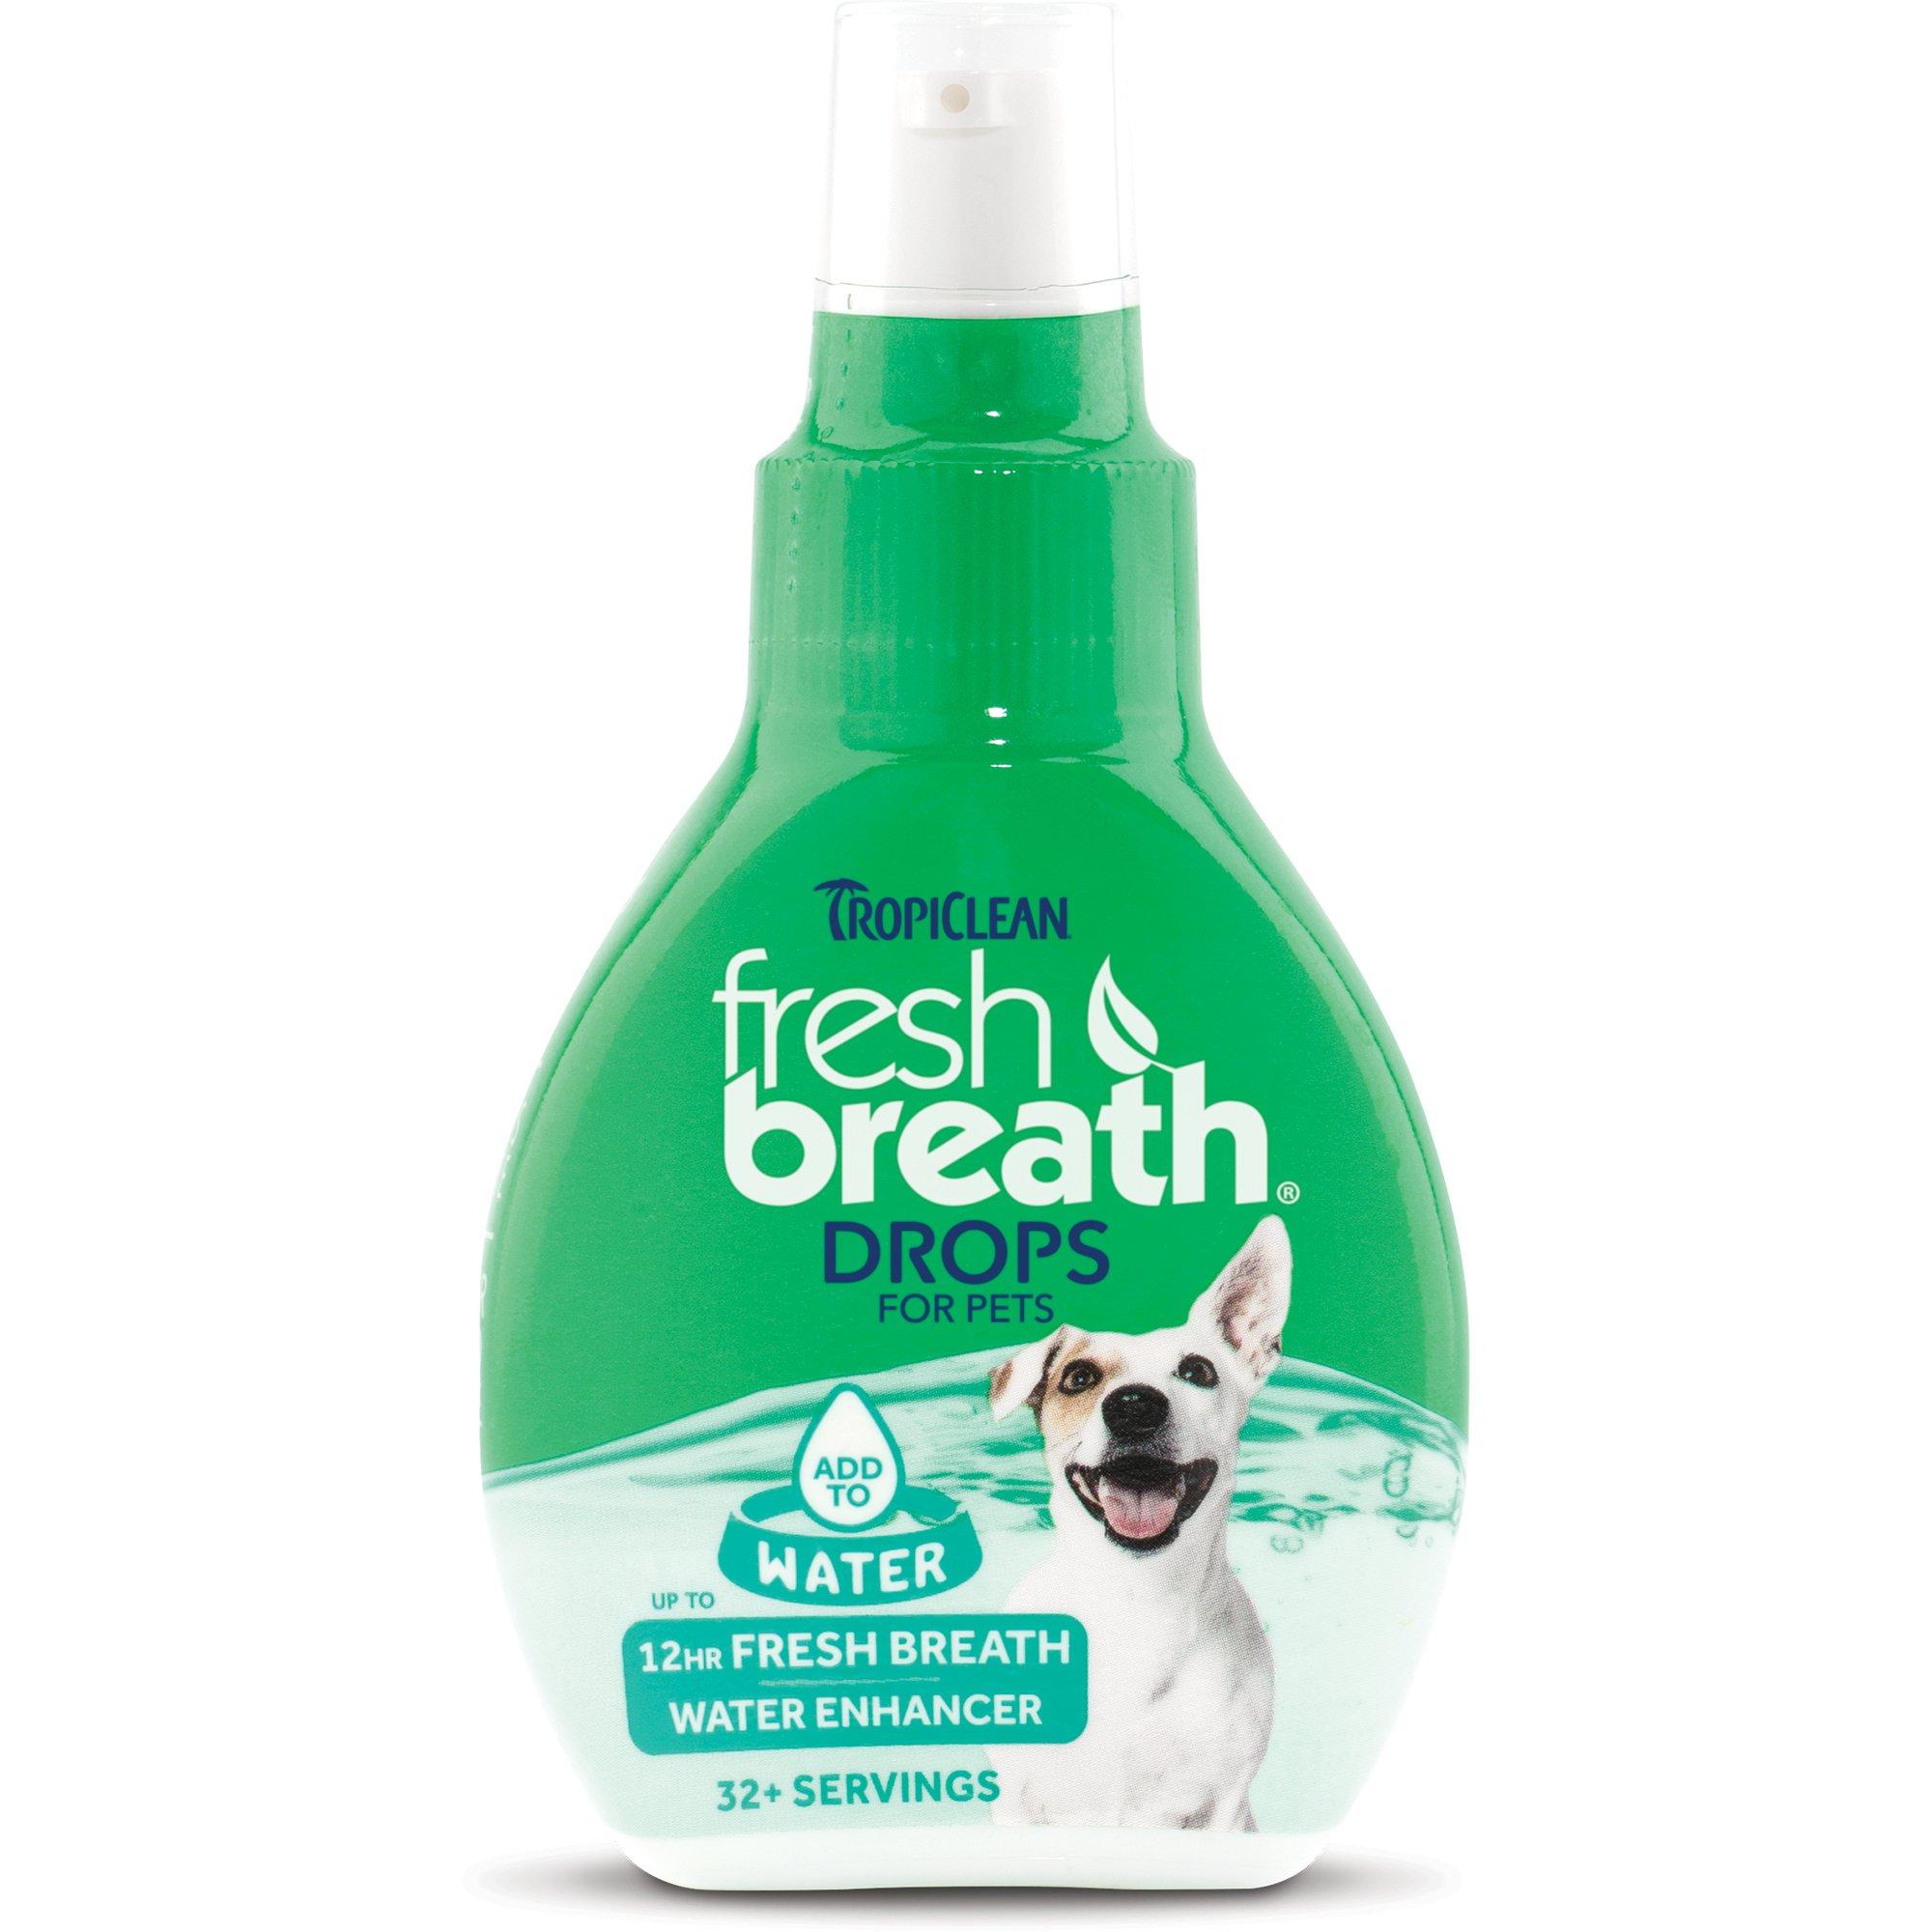 TropiClean Fresh Breath Pet Water Enhancer Drops